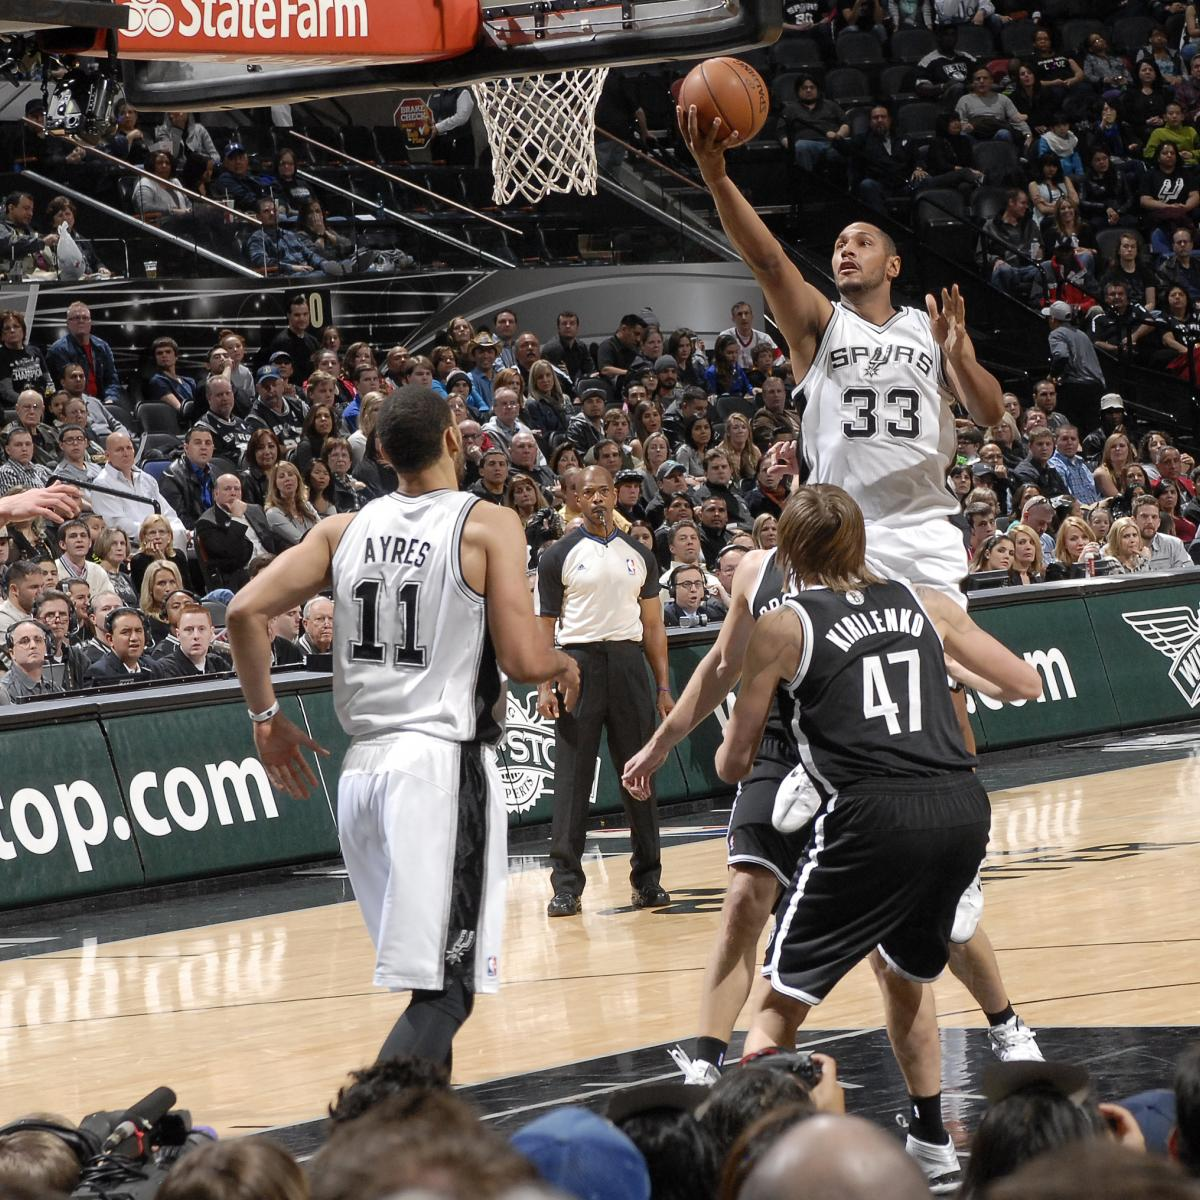 Brooklyn Nets vs. San Antonio Spurs | Barclays Center